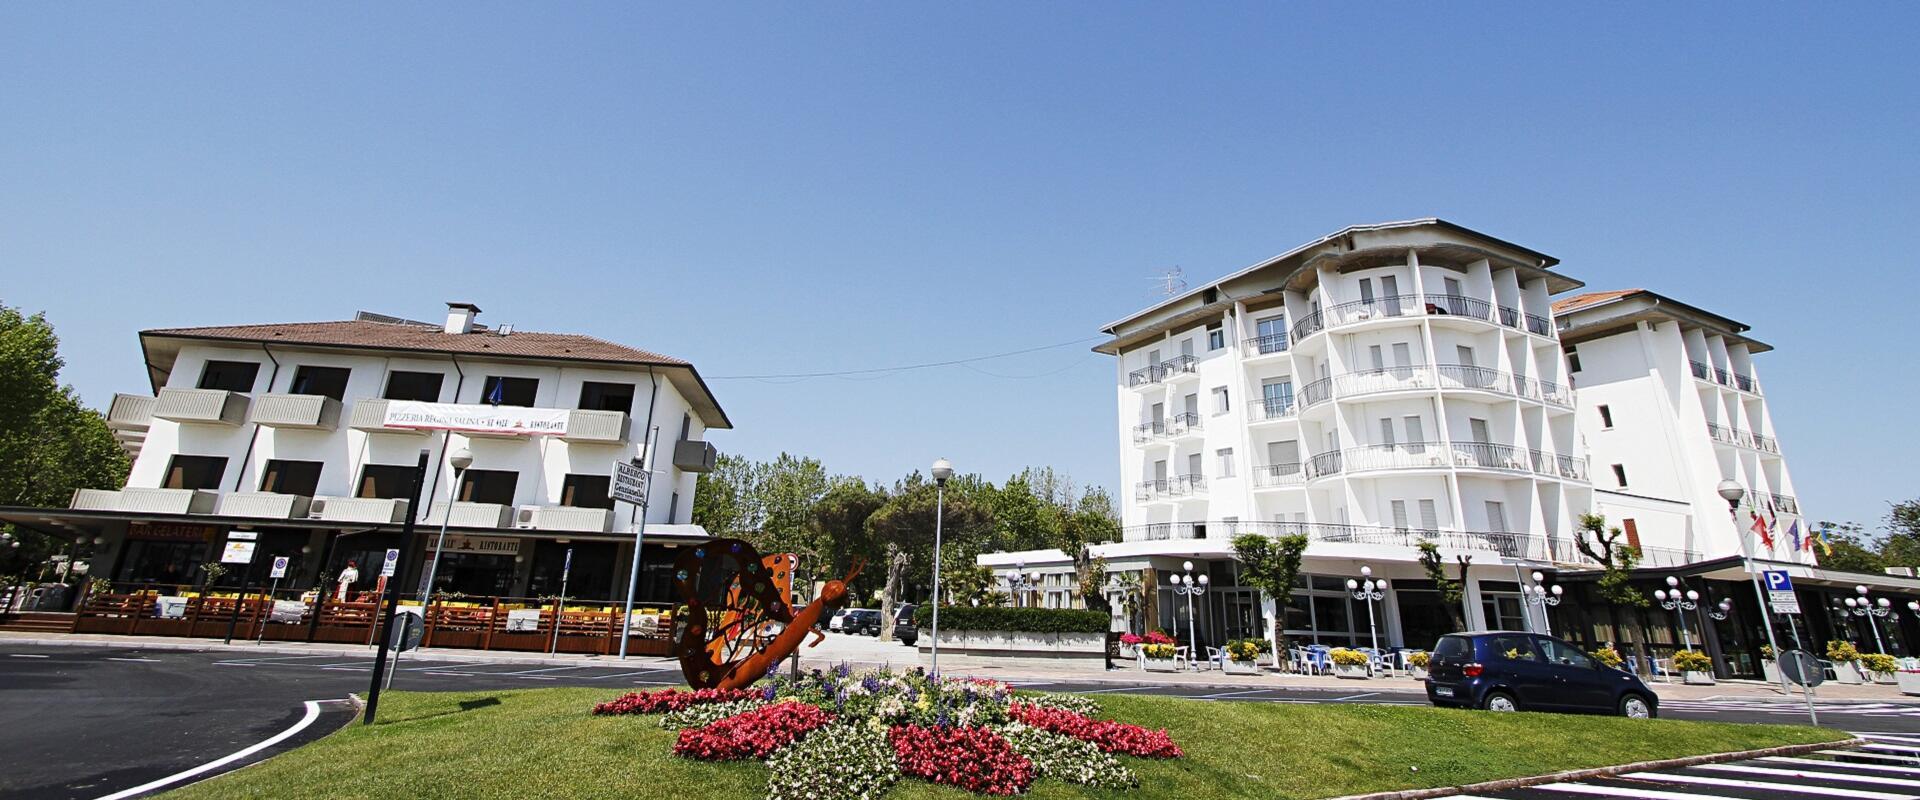 lungomarehotel it archivio-offerte 001